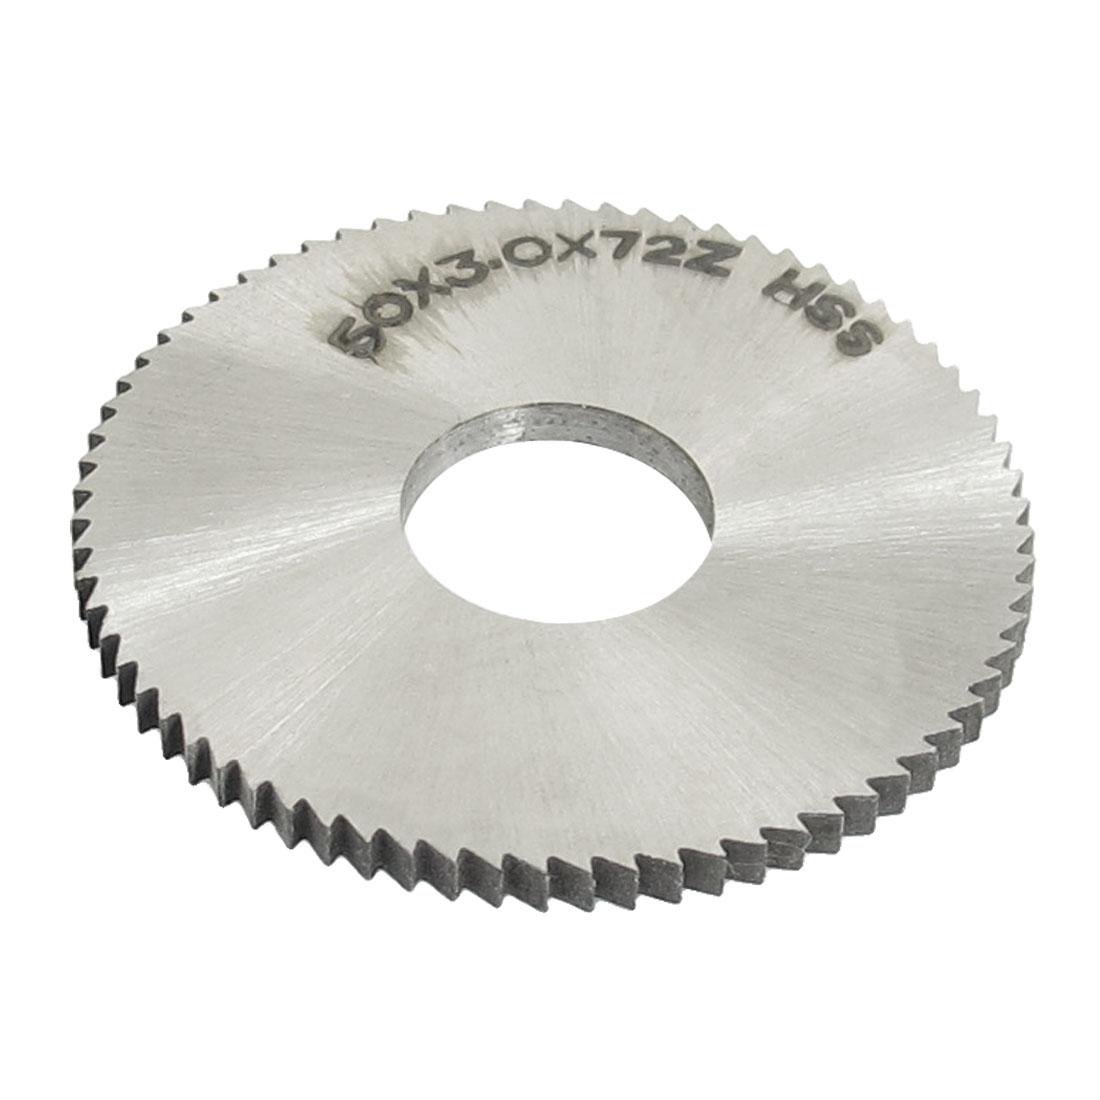 Cutting Tool 50mm x 16mm x 3mm 72 Peg Teeth HSS Slitting Saw